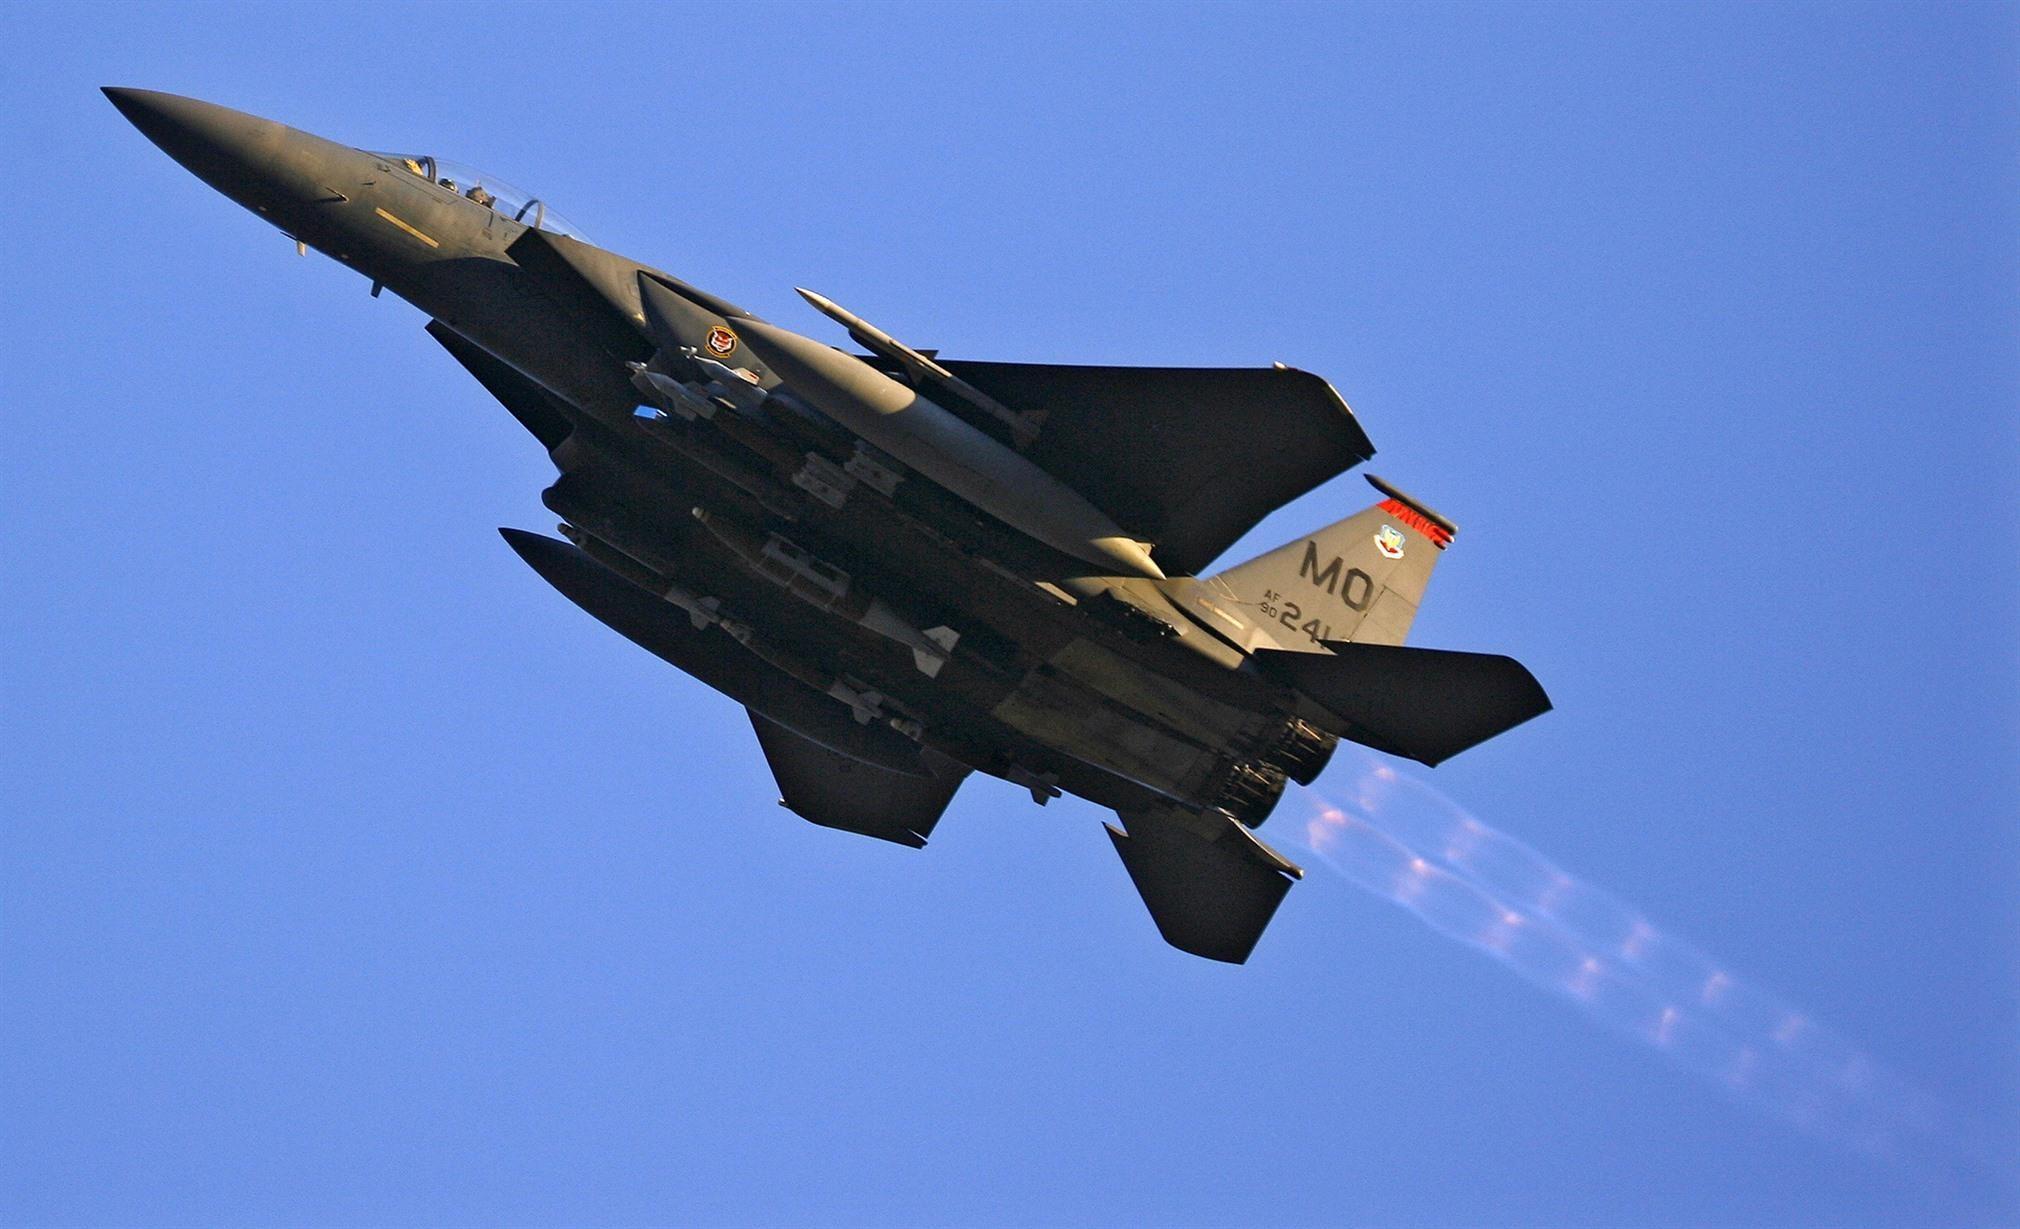 <p>Американский истребитель-бомбардировщик F-15E. Фото: &copy; REUTERS/<span>Bob Strong</span></p>